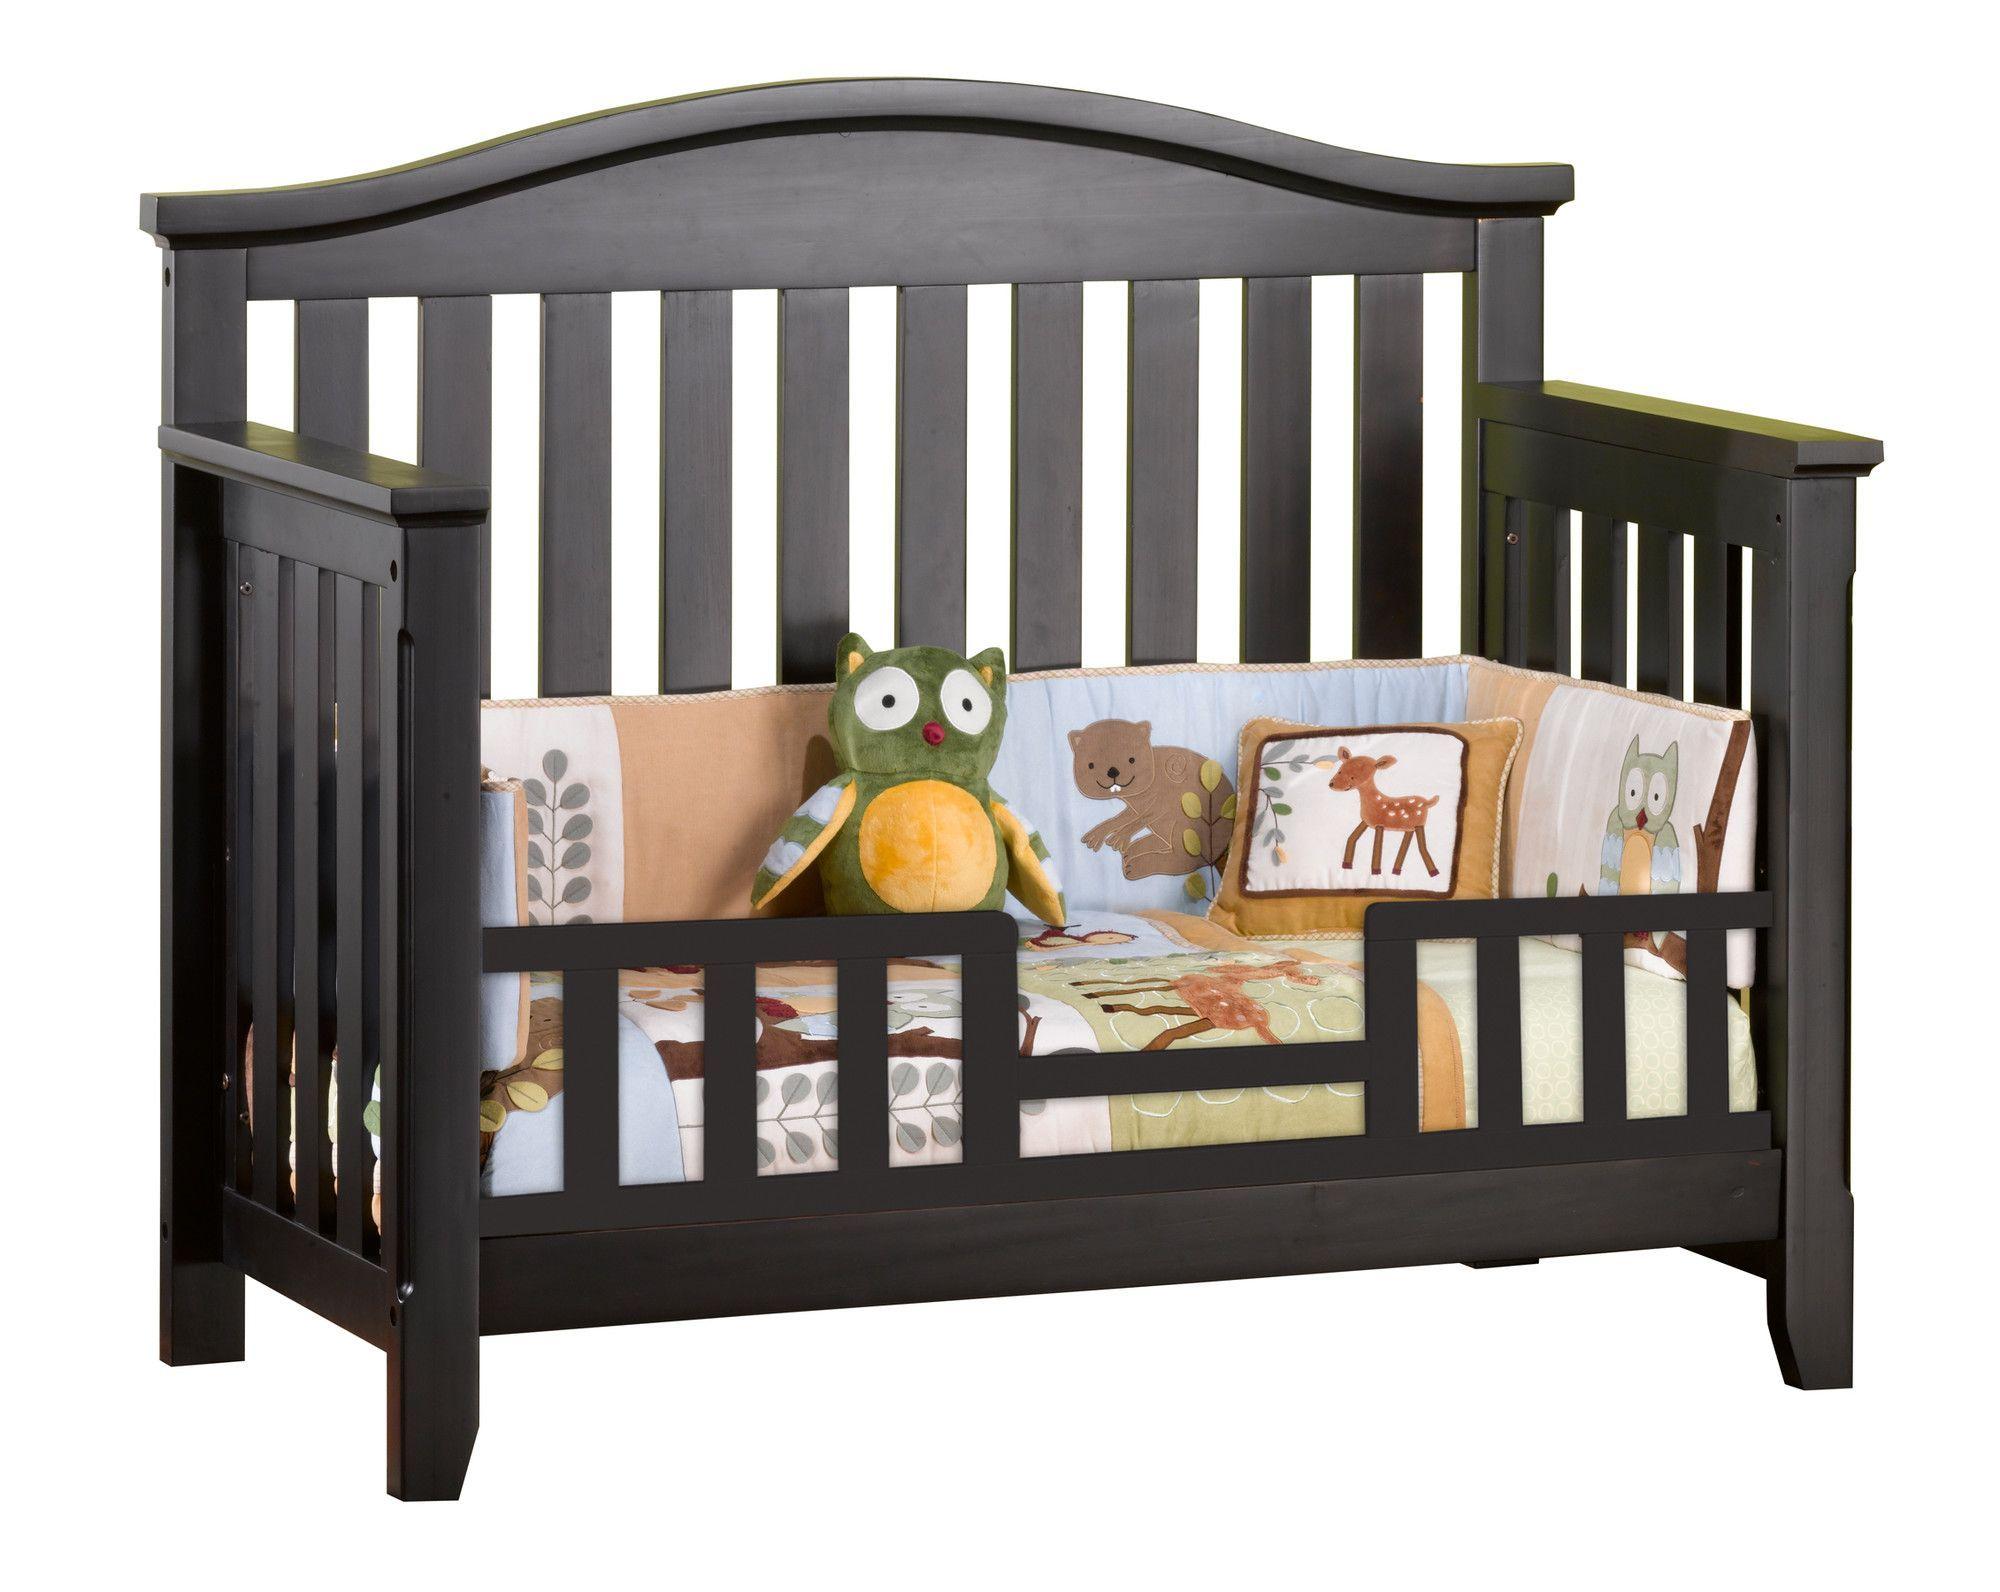 Hawthorne toddler guard rail cribs nursery crib bed